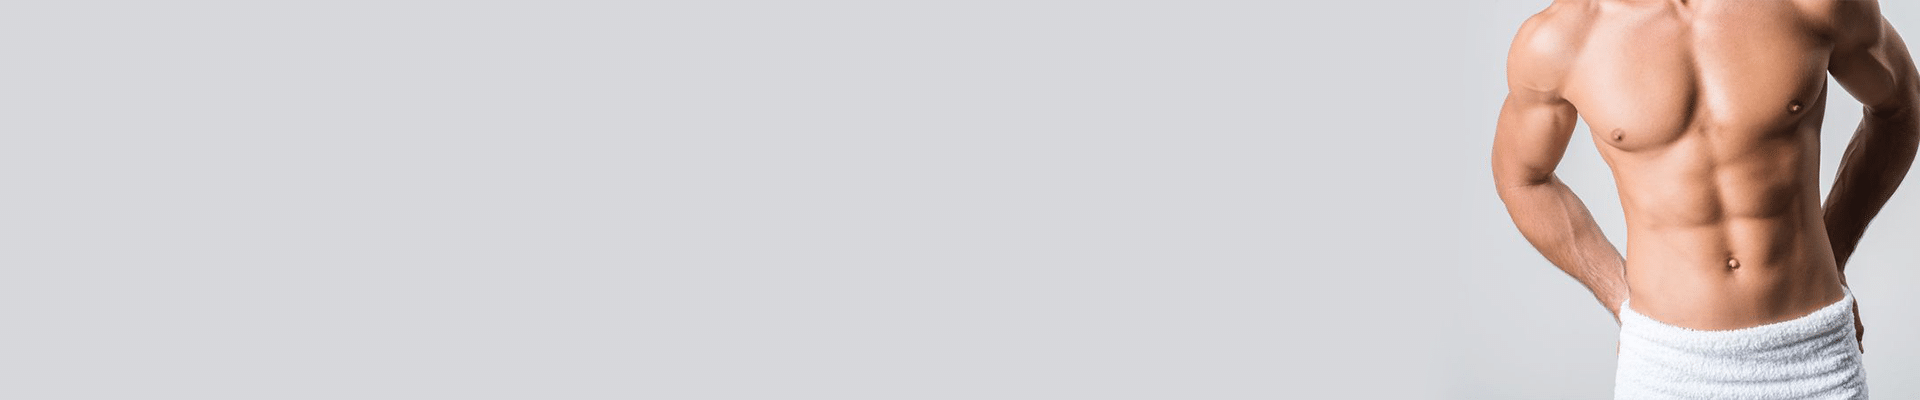 [:fr]Chirurgie homme à Nabeul : Chirurgie esthétique homme prix[:ar]الجراحة التجميلية للرجال في نابل : سعر الجراحة التجميلية للرجال[:]